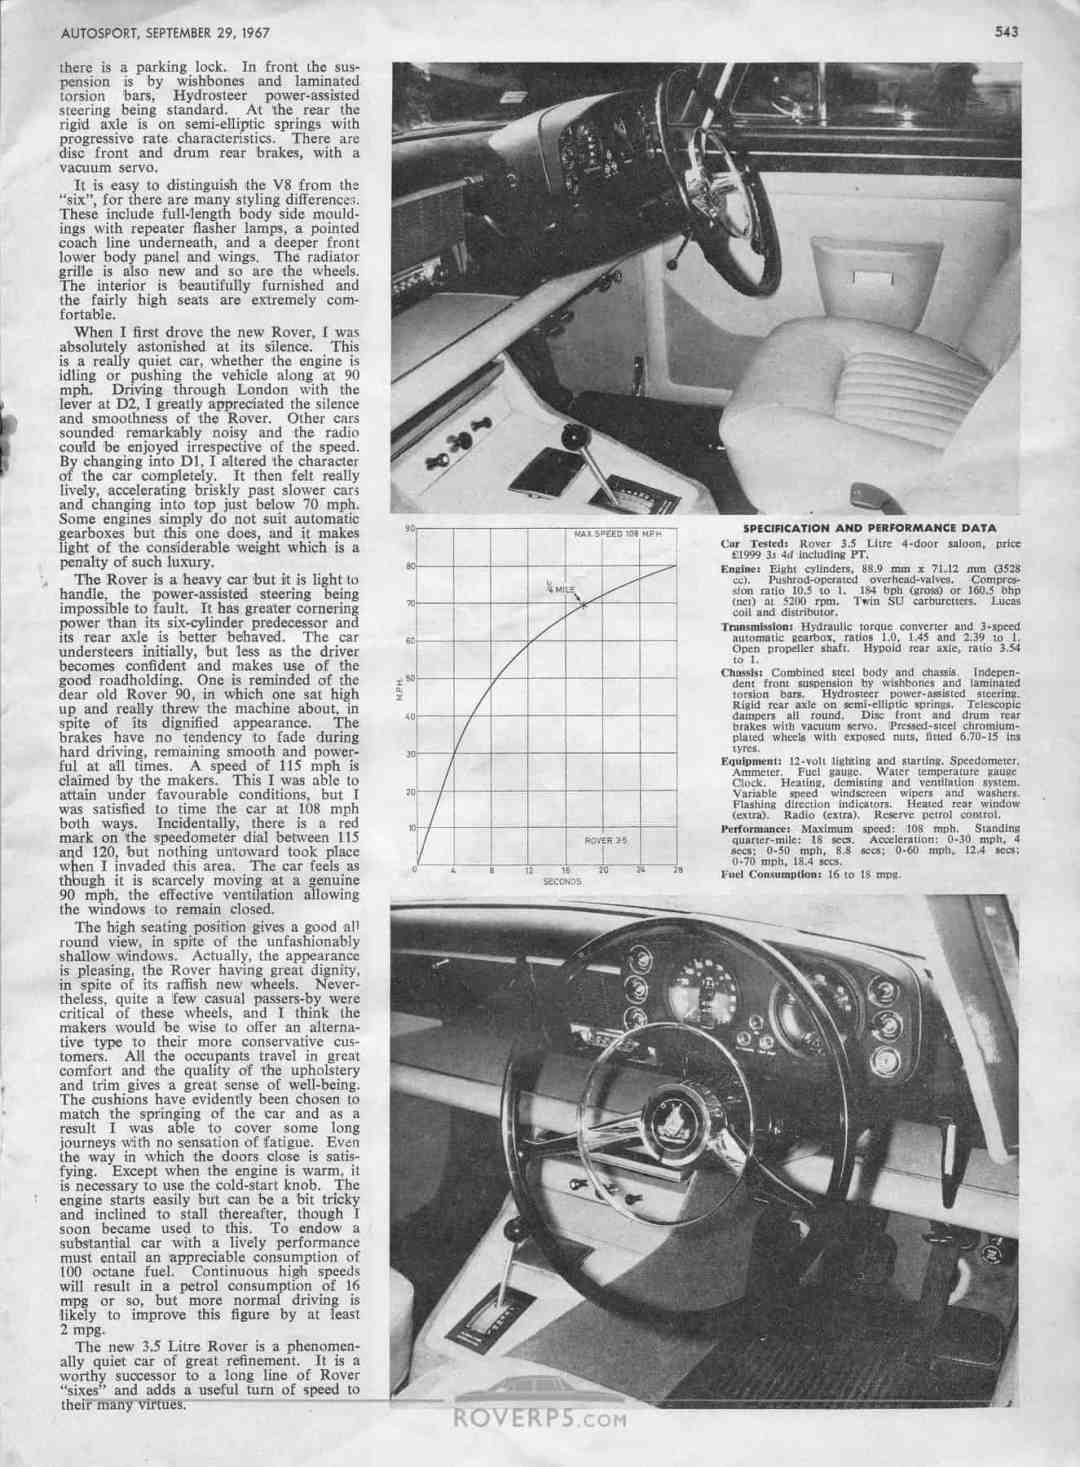 Magazine - 19670929 - Autosport - Page 543